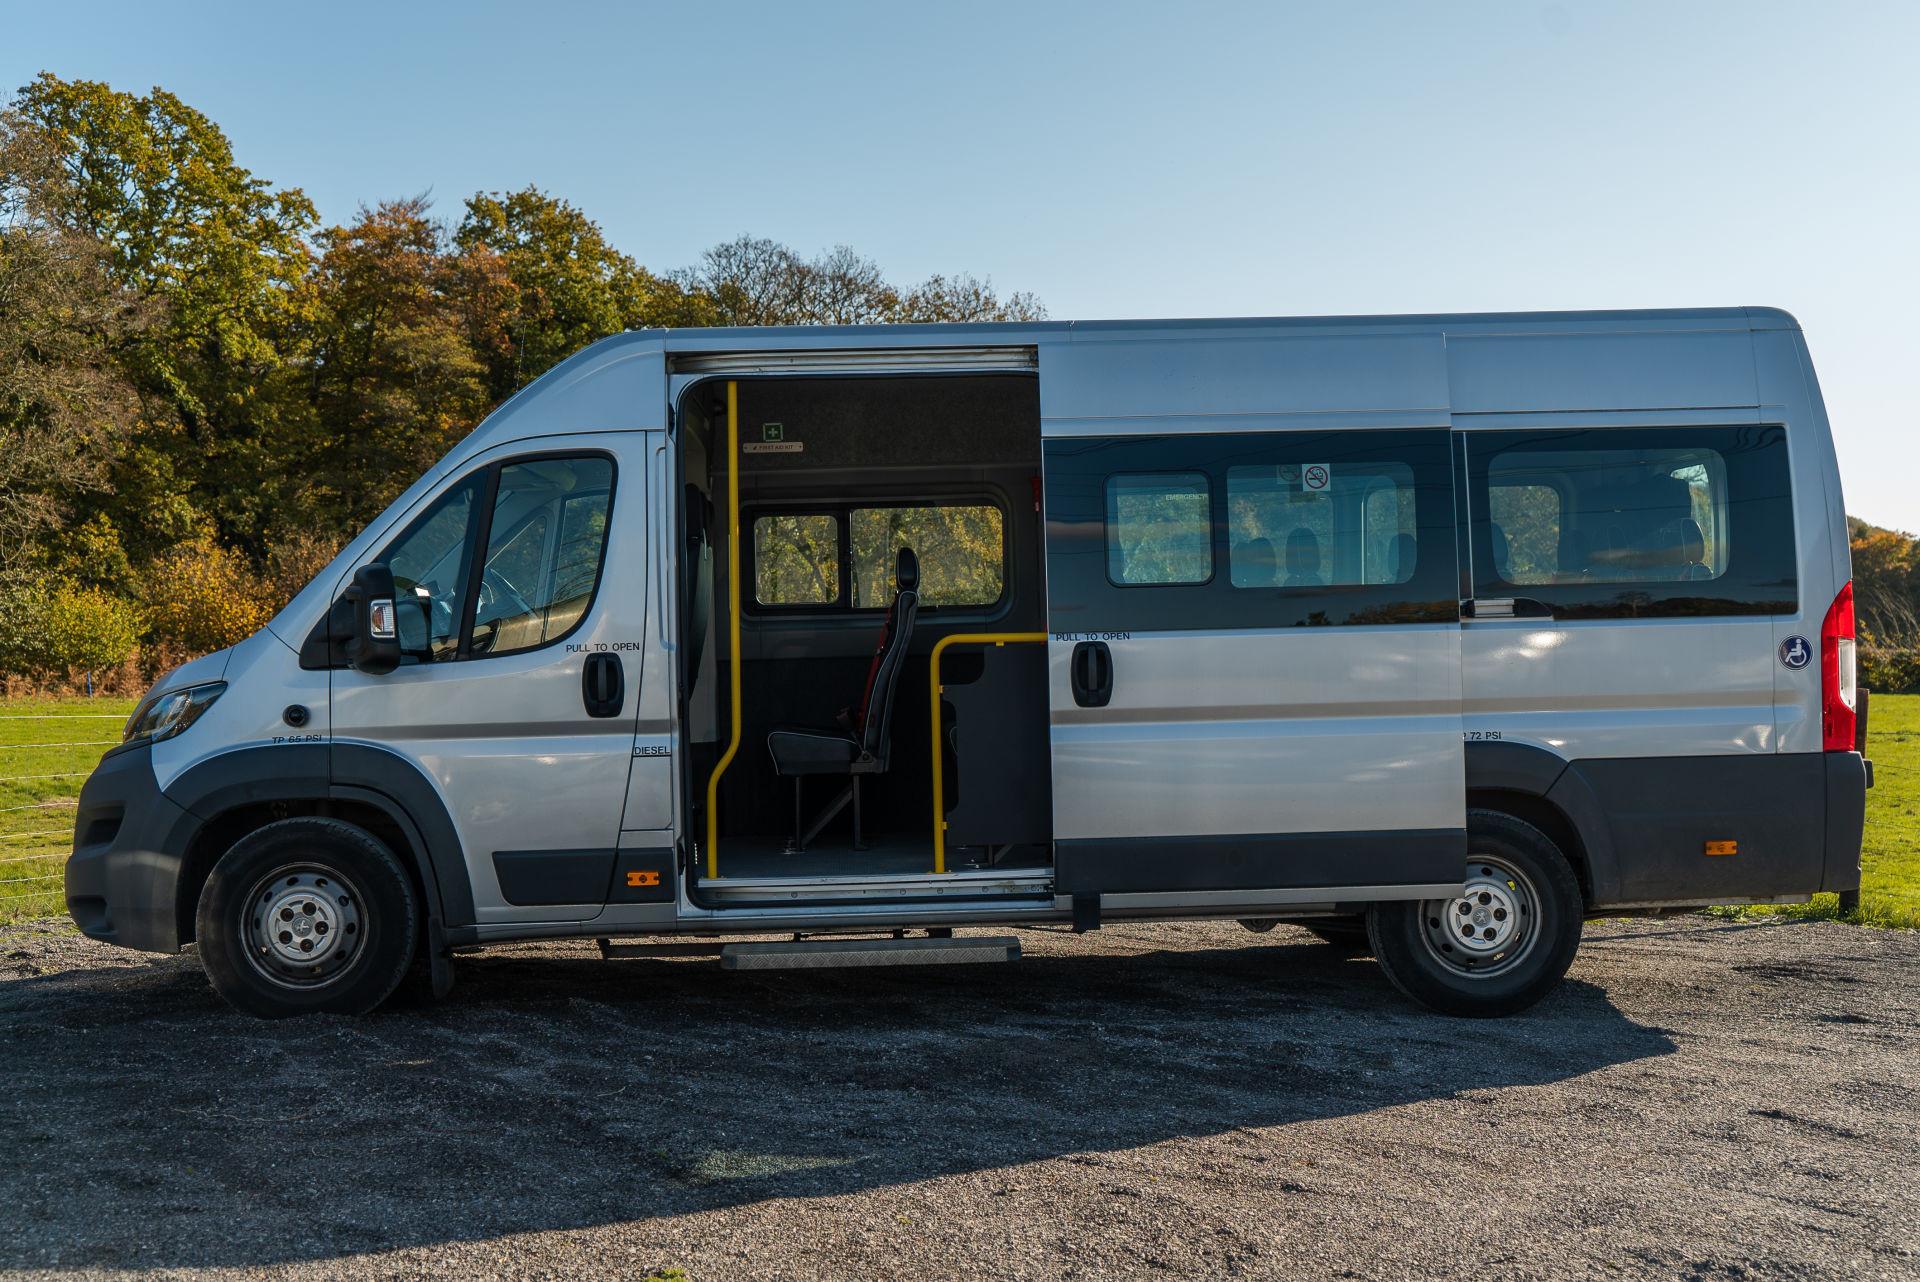 2017 Peugeot Boxer 17 Seater Accessible Minibus for Sale - Image 5